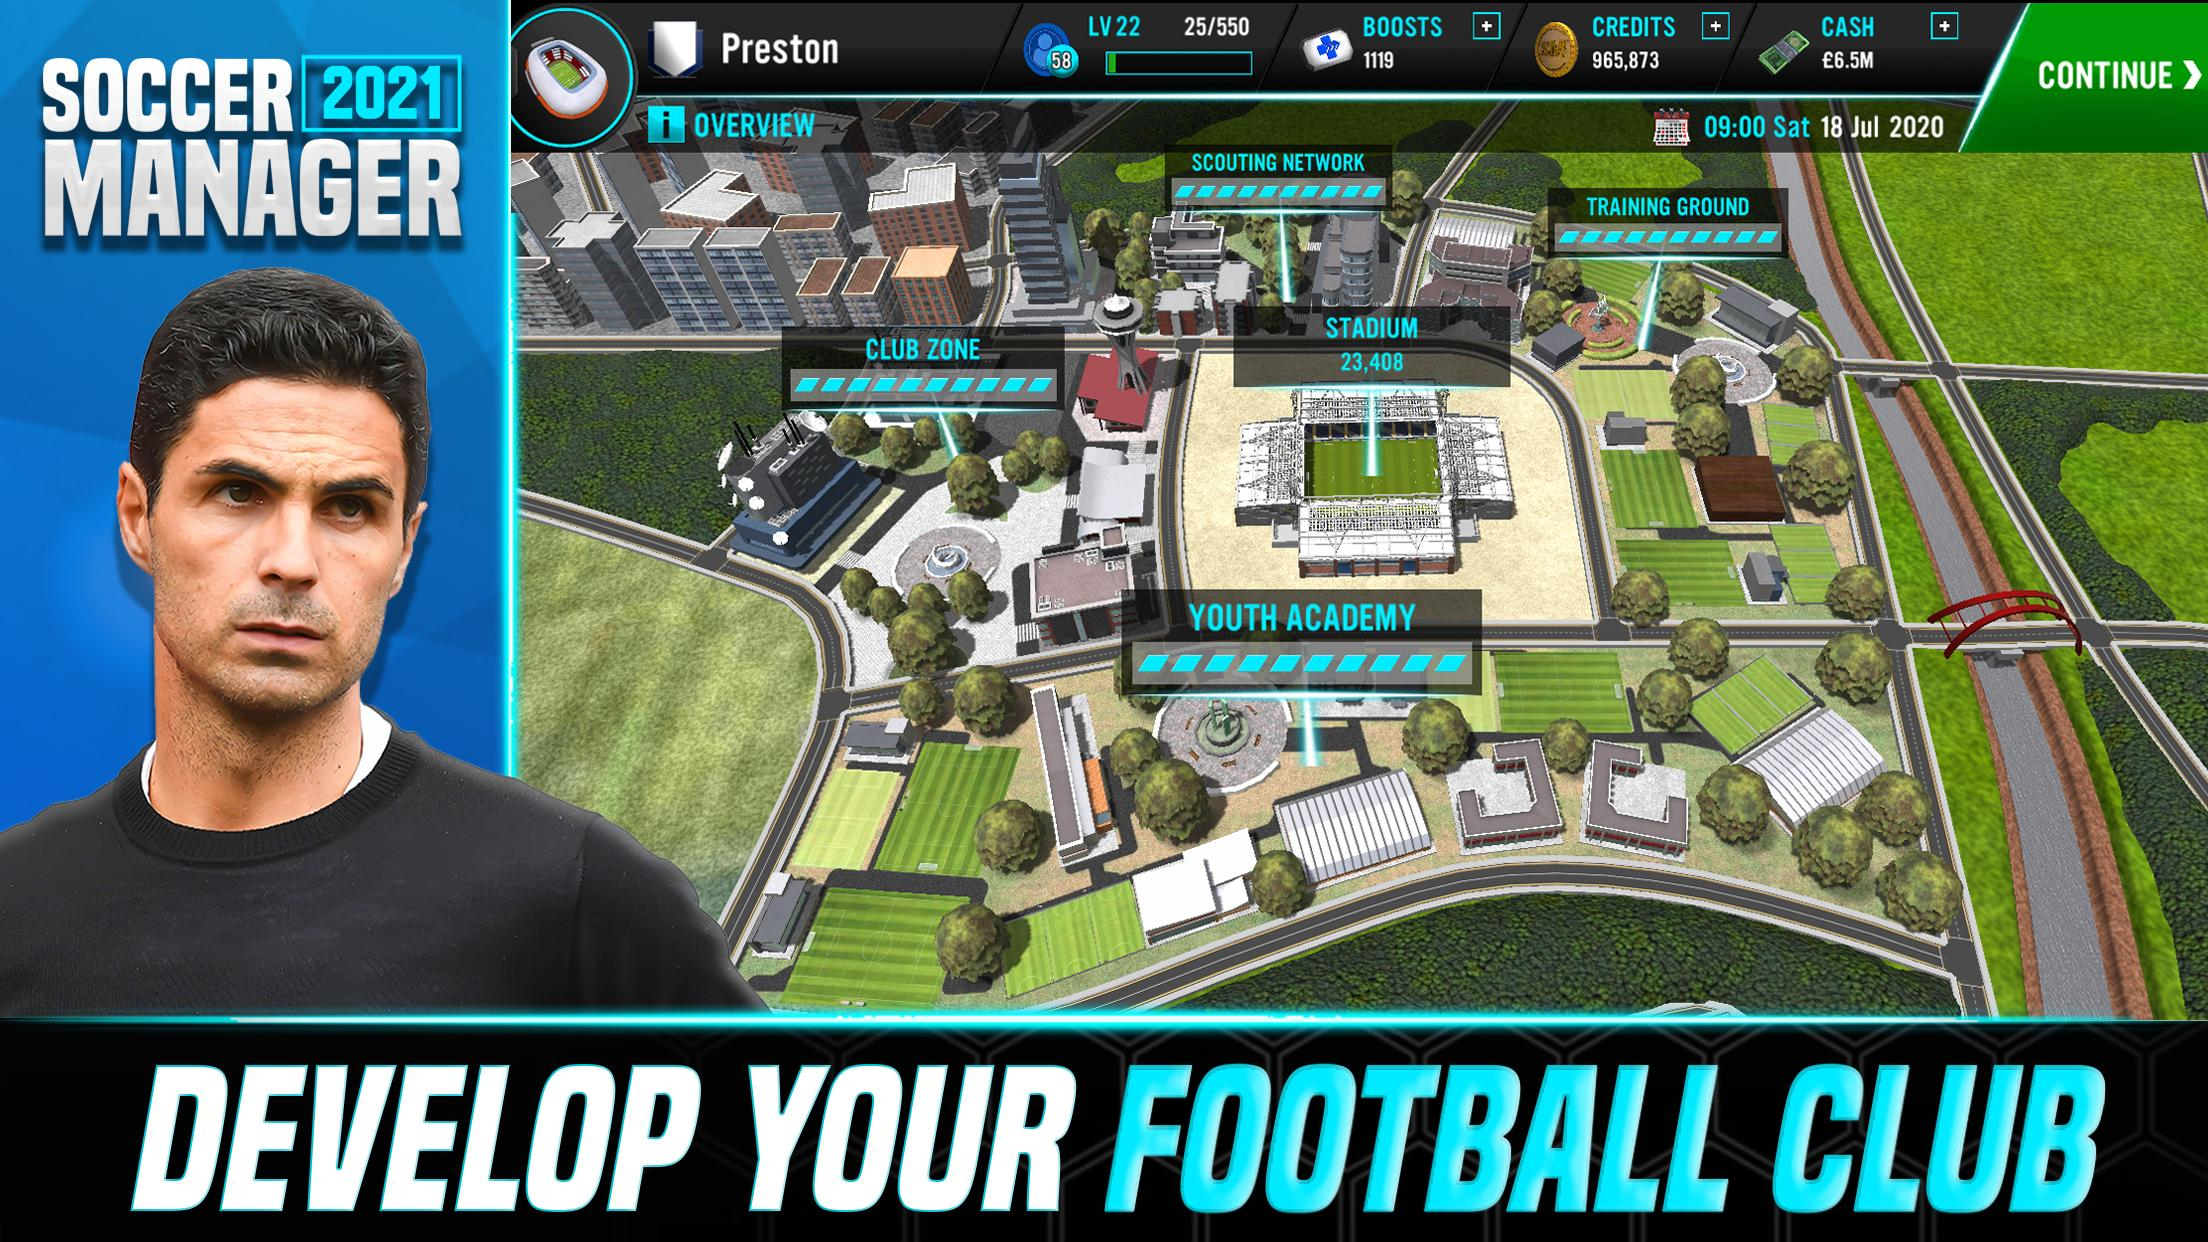 Soccer Manager 2021 - Football Management Game